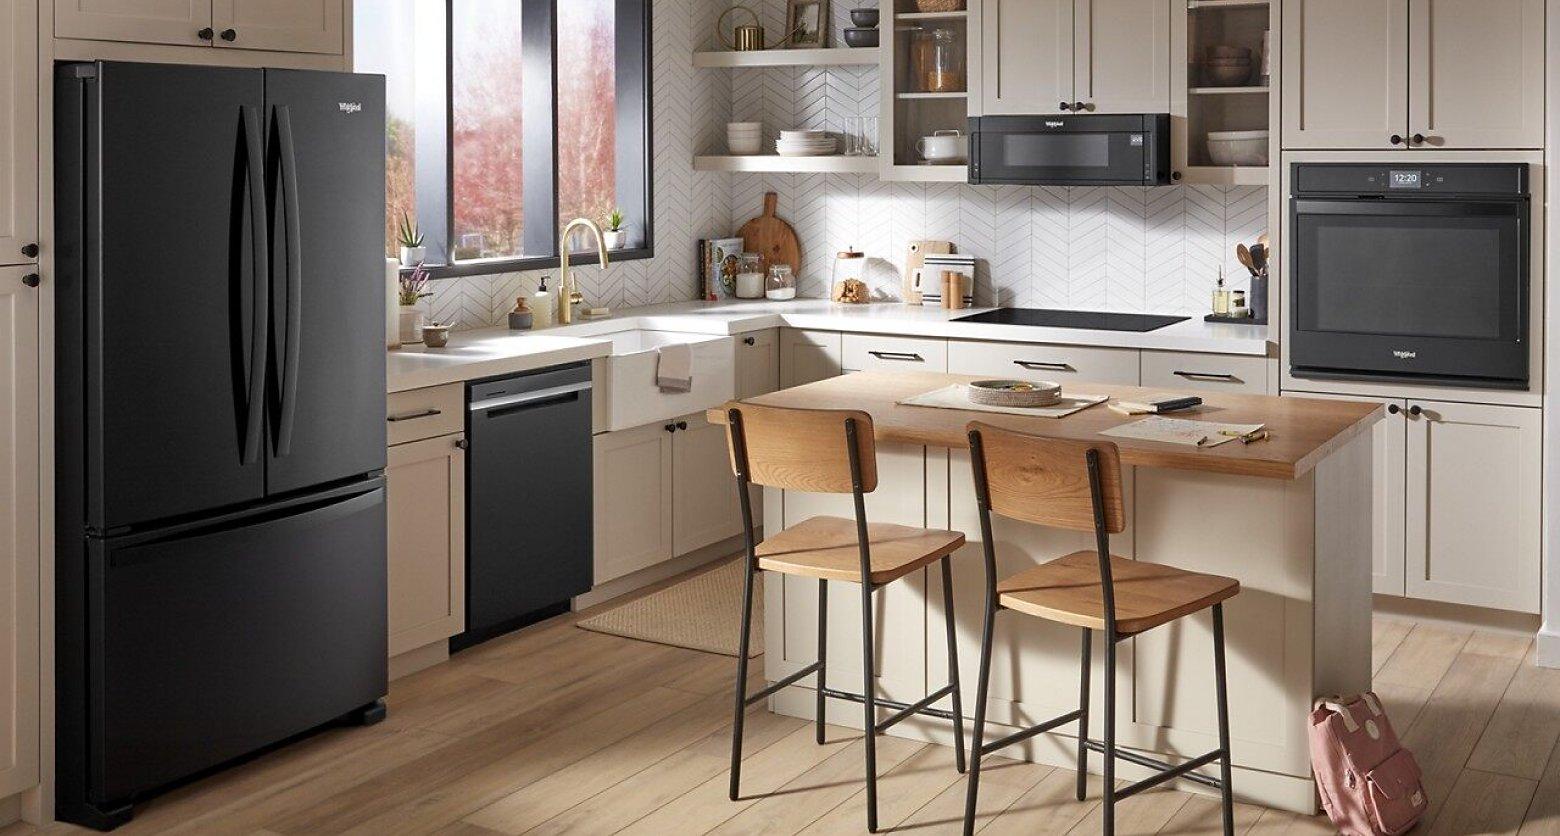 Kitchen featuring Whirlpool® appliances in black